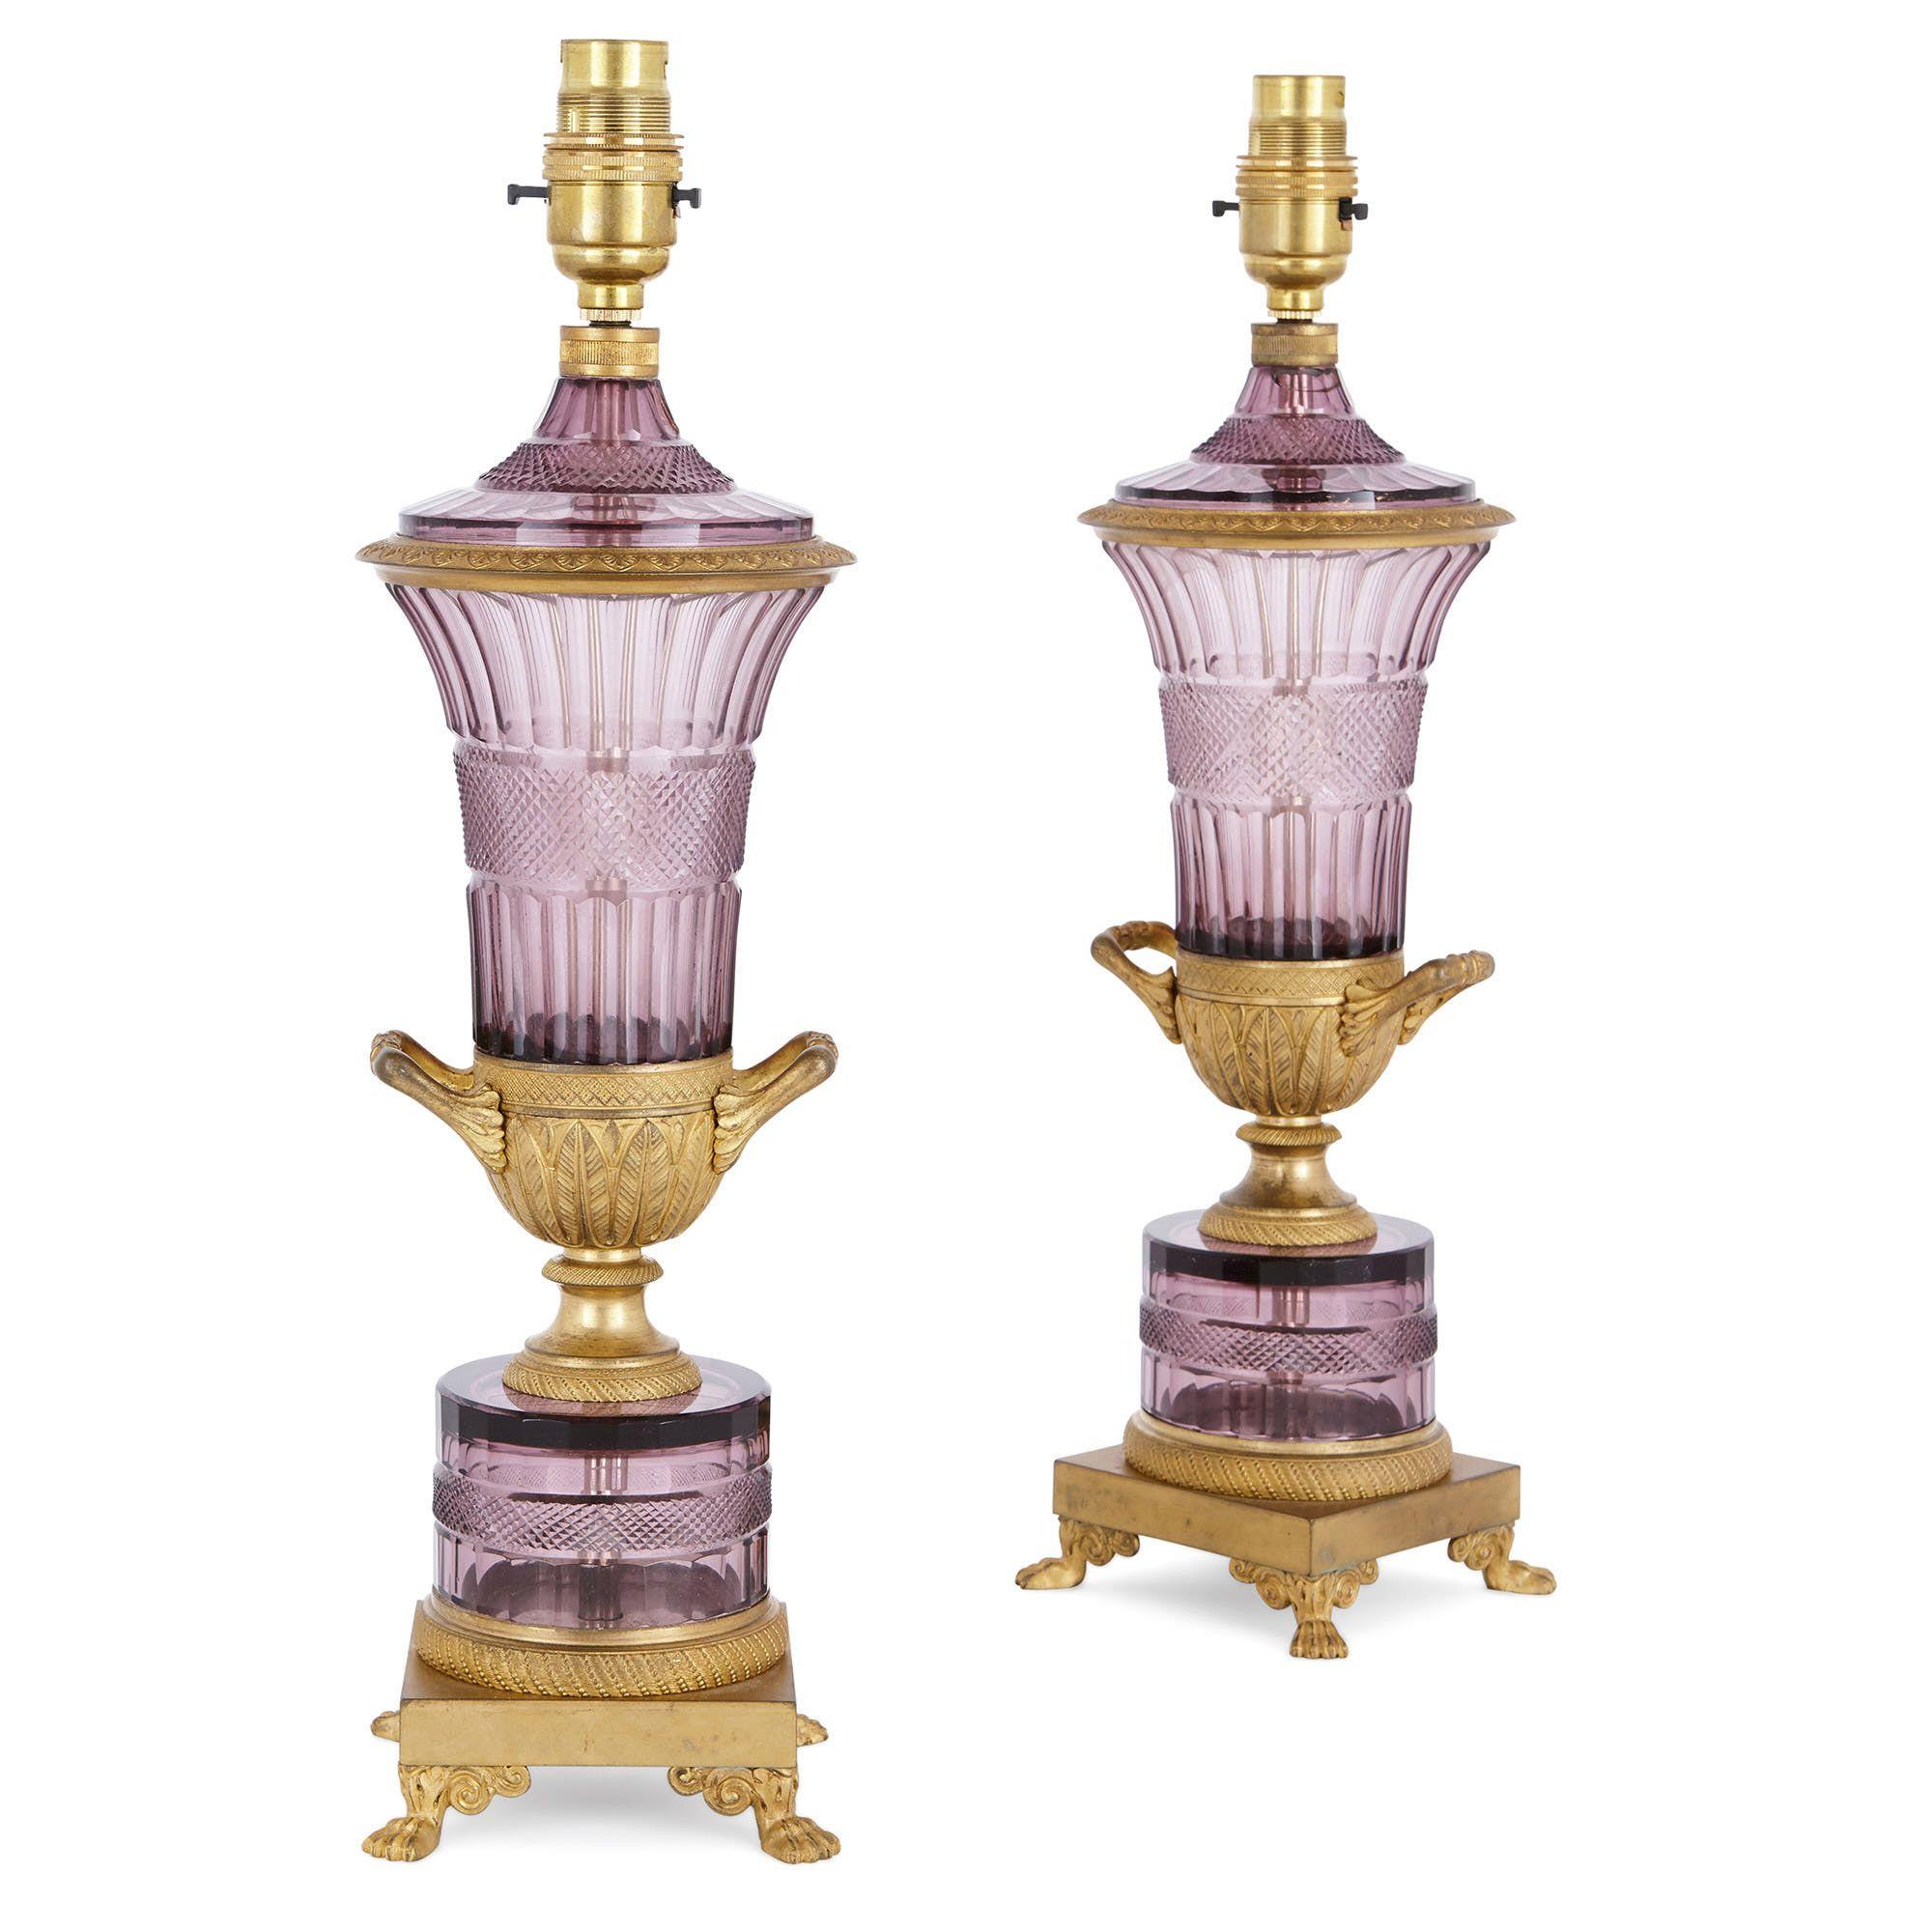 Pair of Louis XVI style ormolu and amethyst crystal lamps